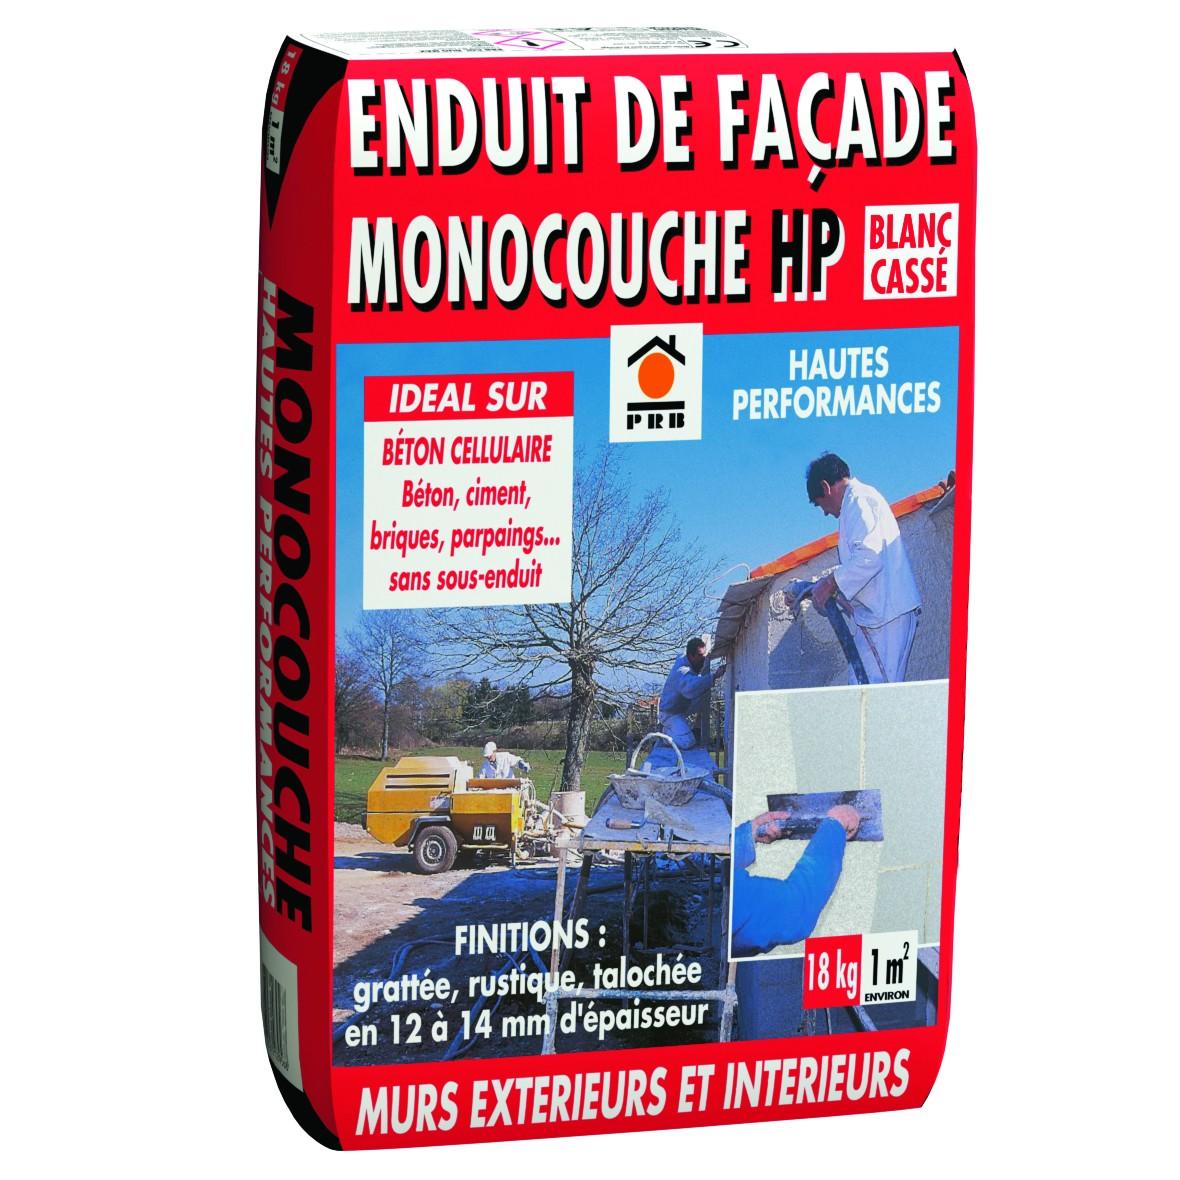 Pose Enduit De Facade Monocouche gsb bati enduit de facade monocouche hp